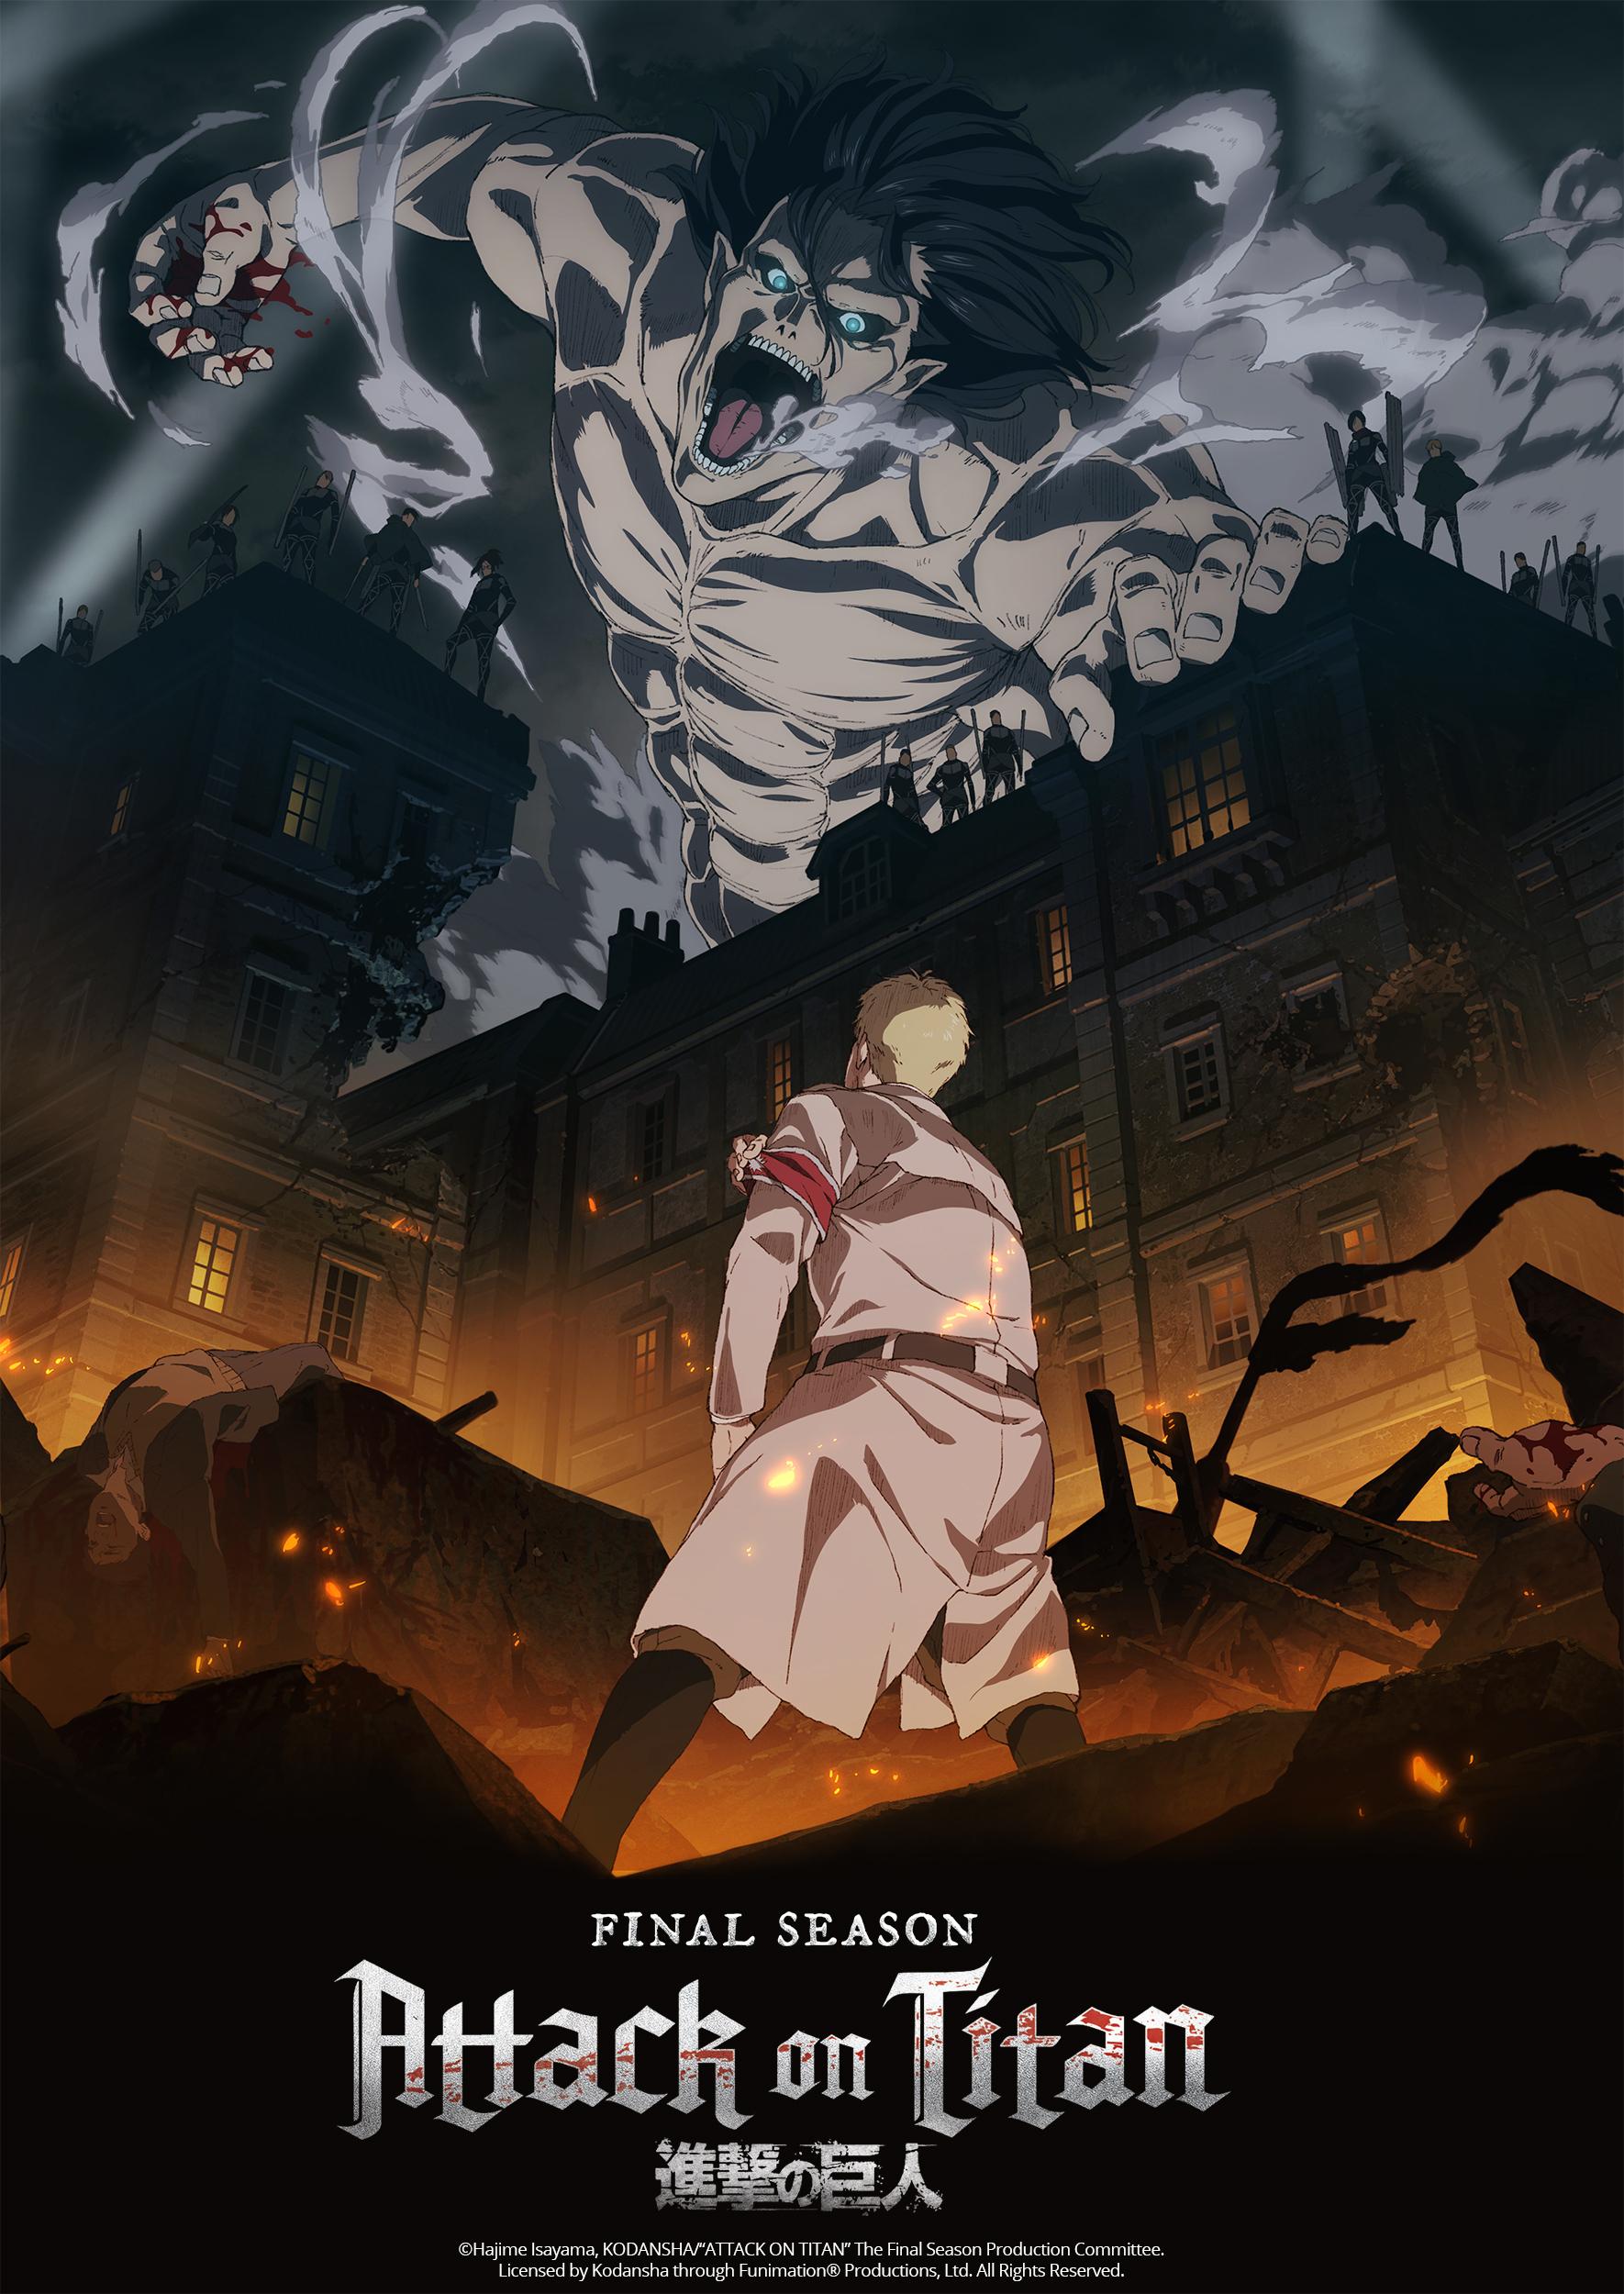 TV动画《进击的巨人 最终季》新视觉图公开,12月7日开播 - ACG17.COM